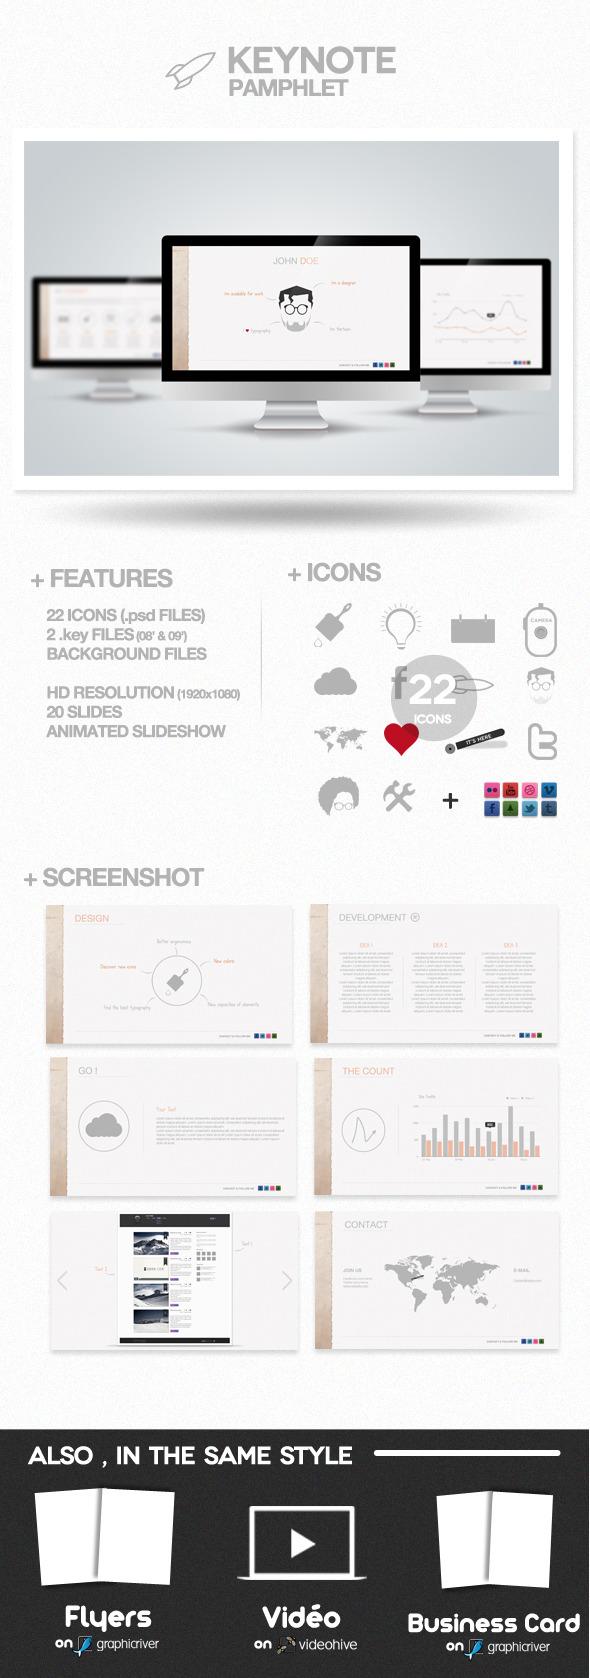 Pamphlet Presentation - Creative Keynote Templates